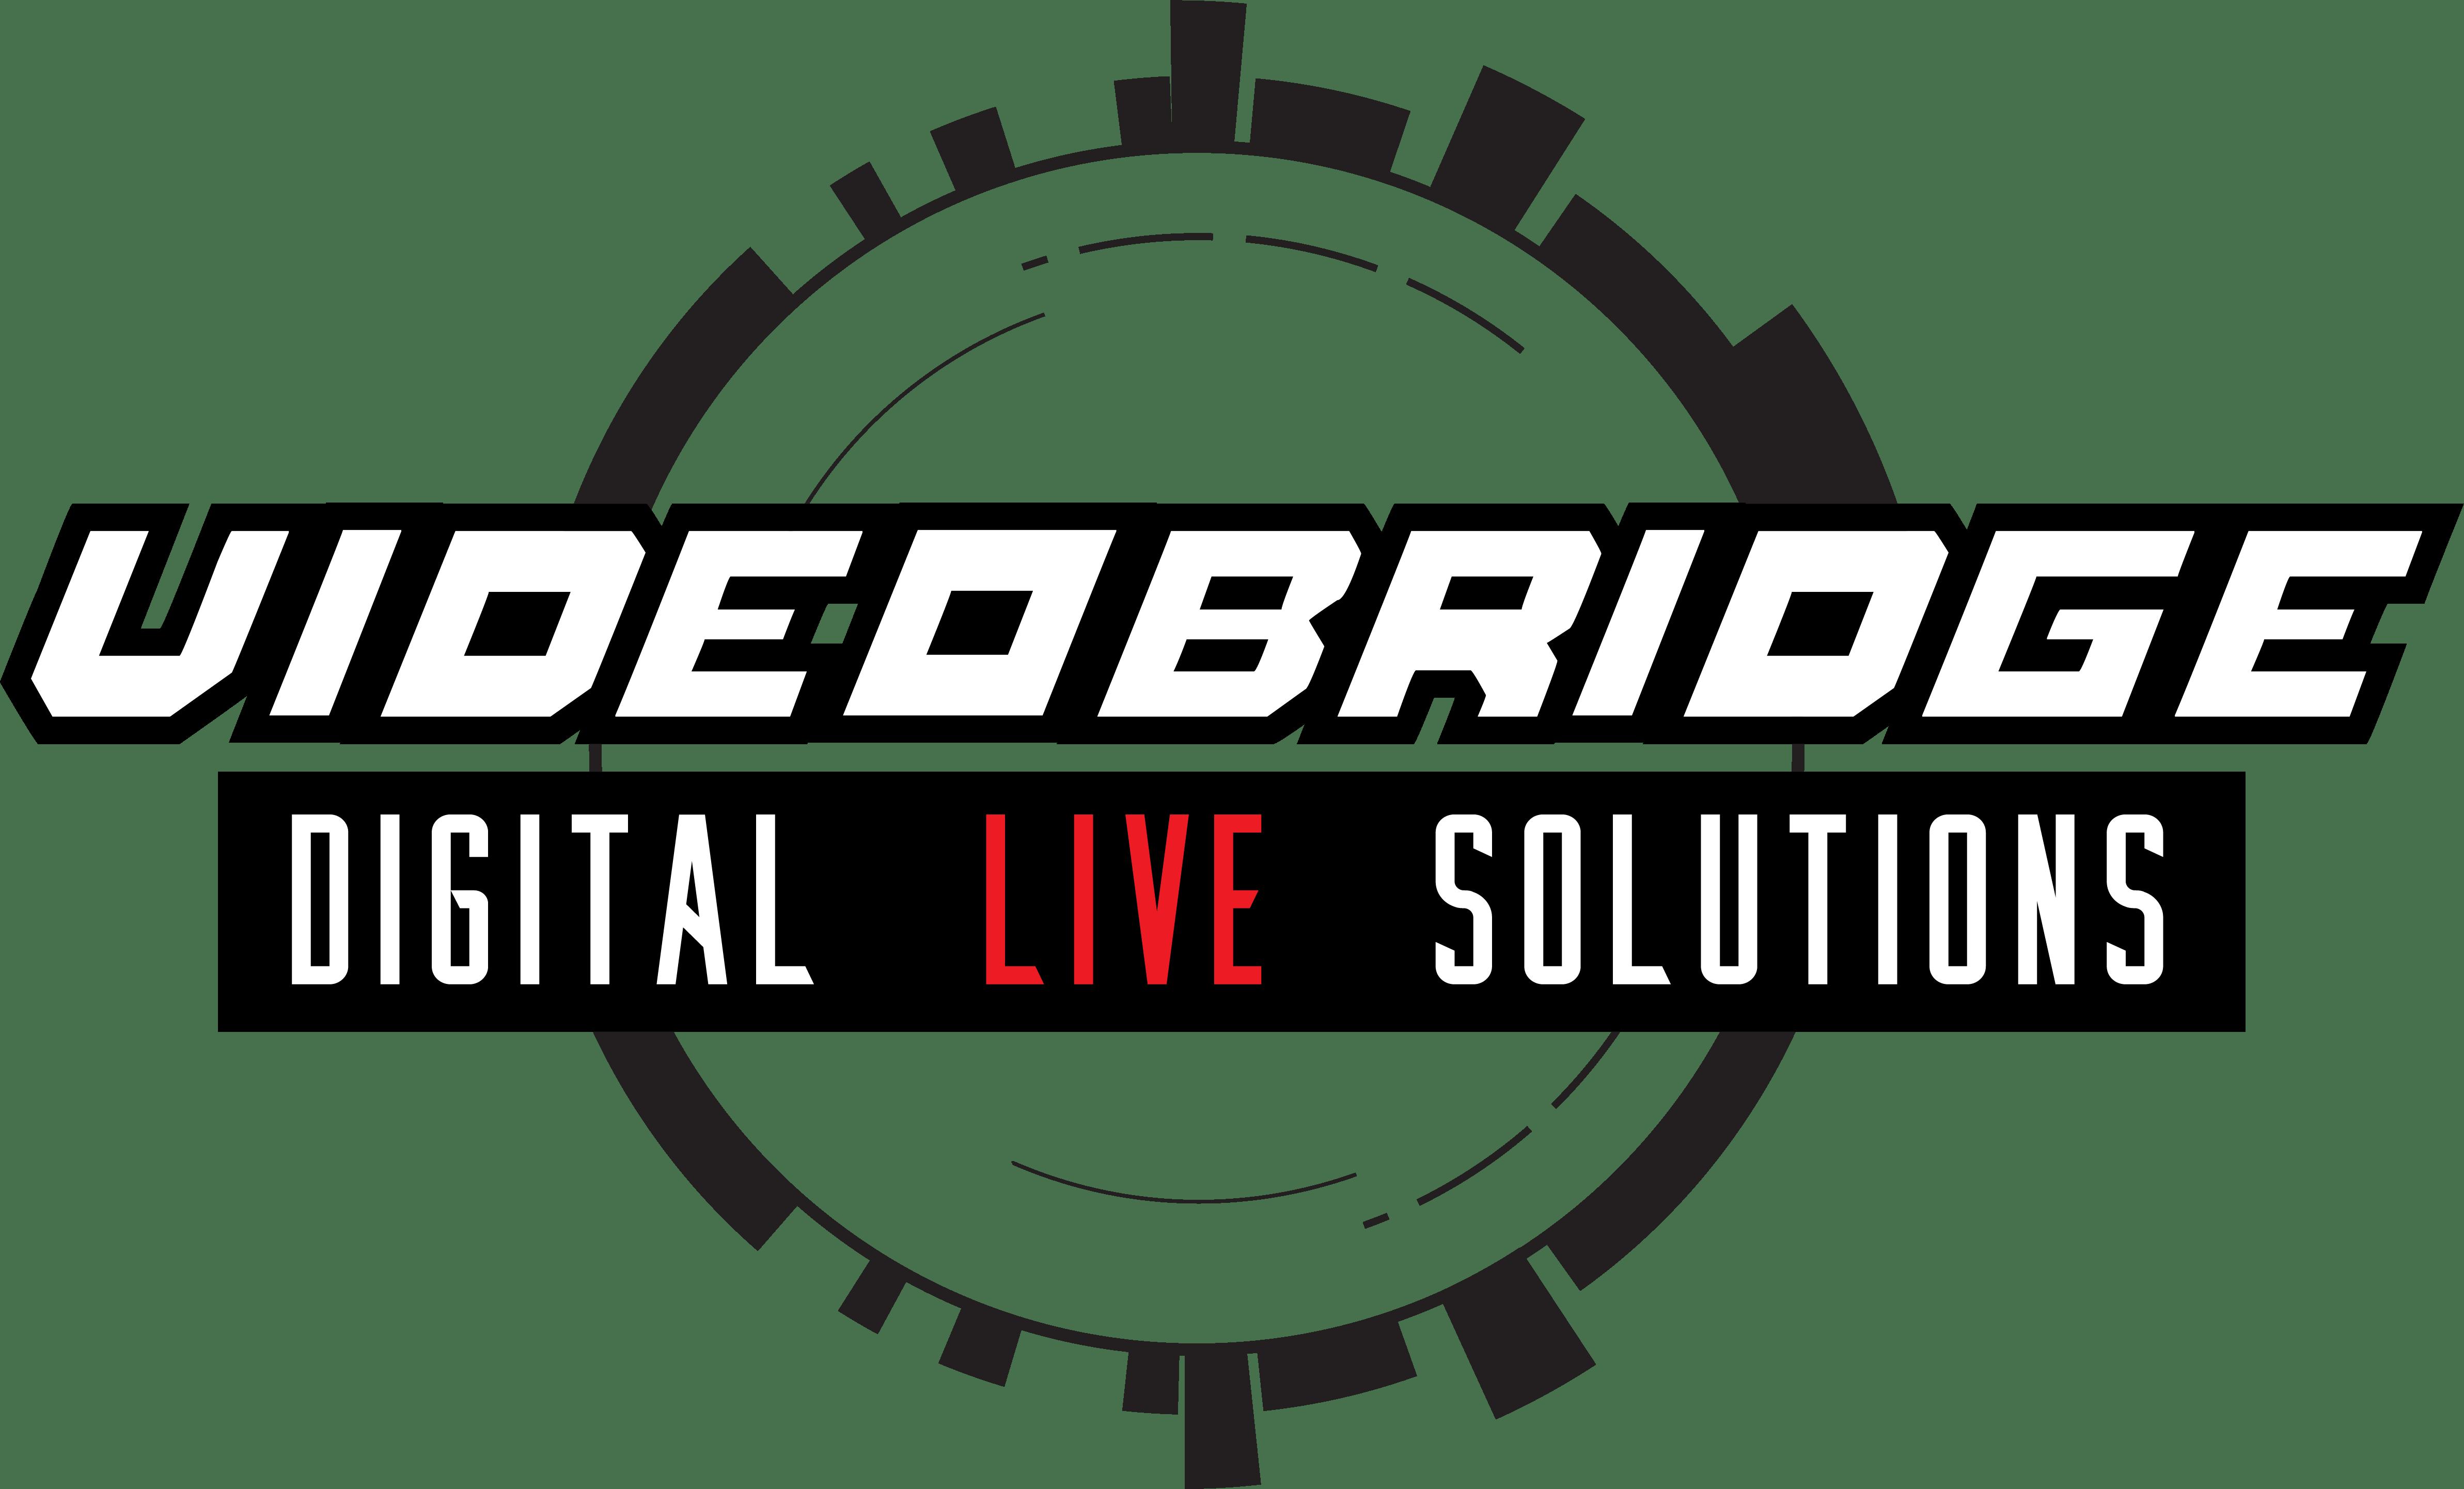 VideoBridge logo